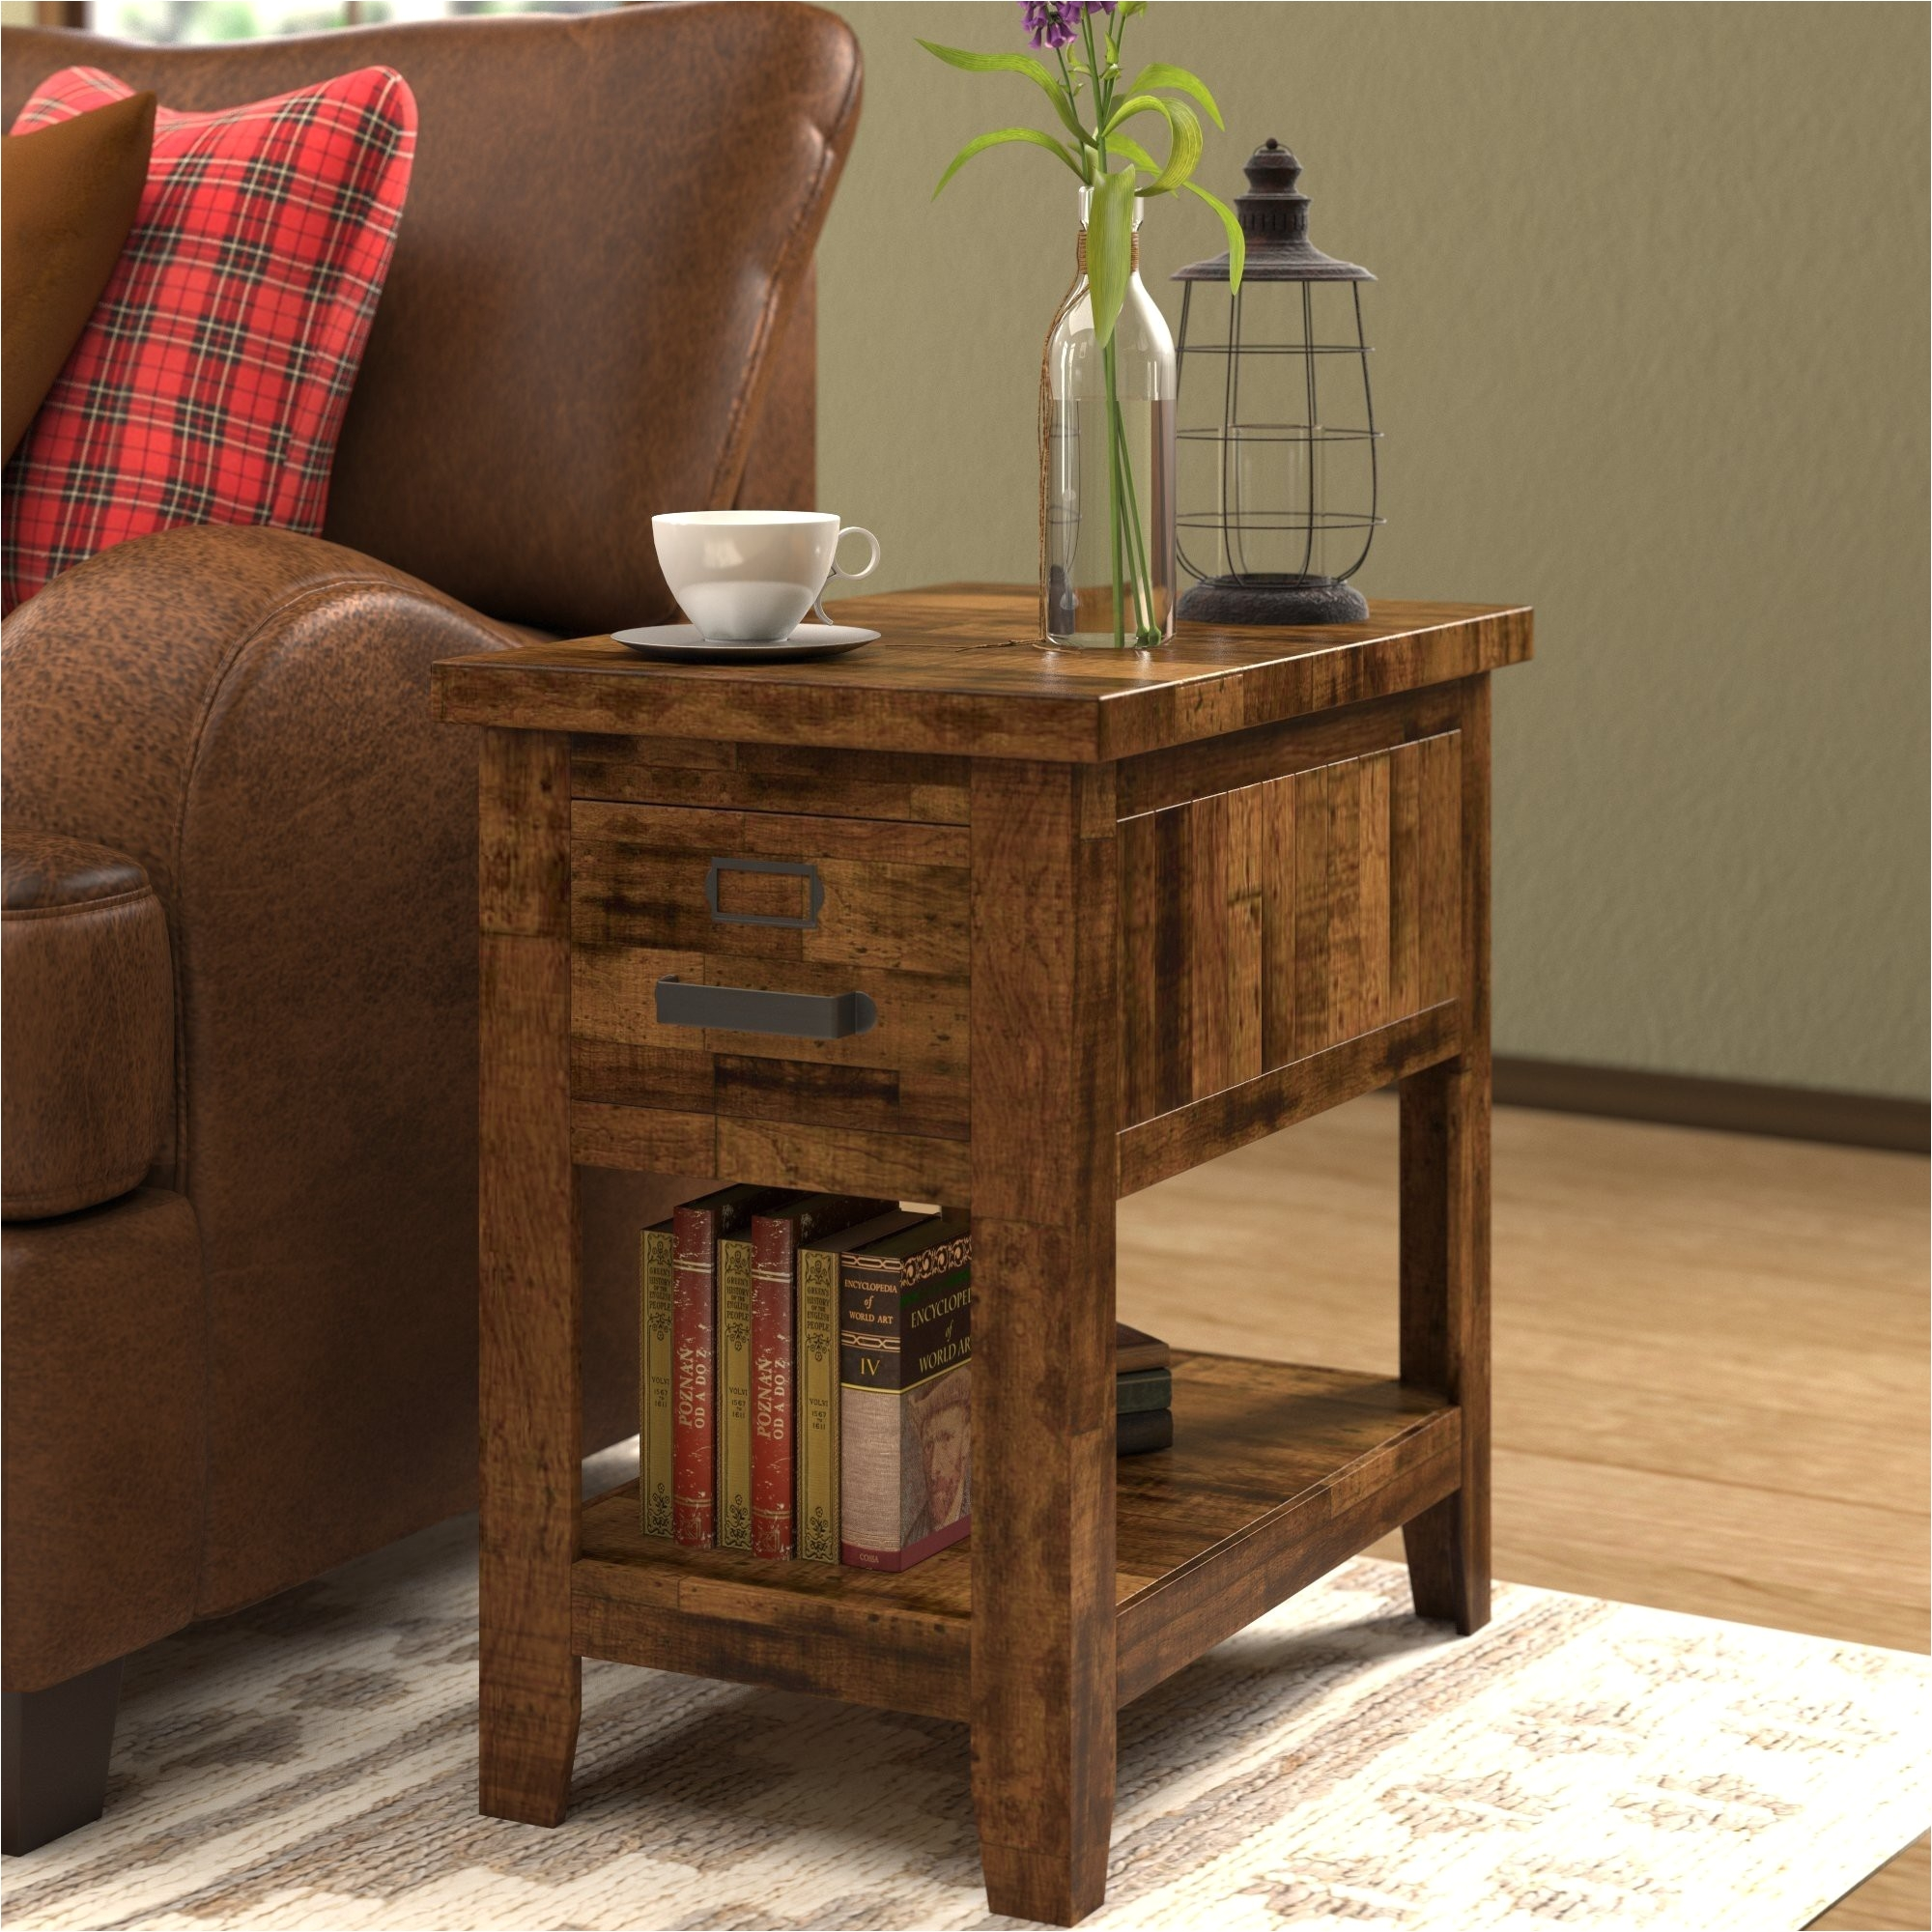 Engaging Wood Side Tables Living Room Valid The Terrific Unbelievable Storage Chest End Table S Jockboymusic